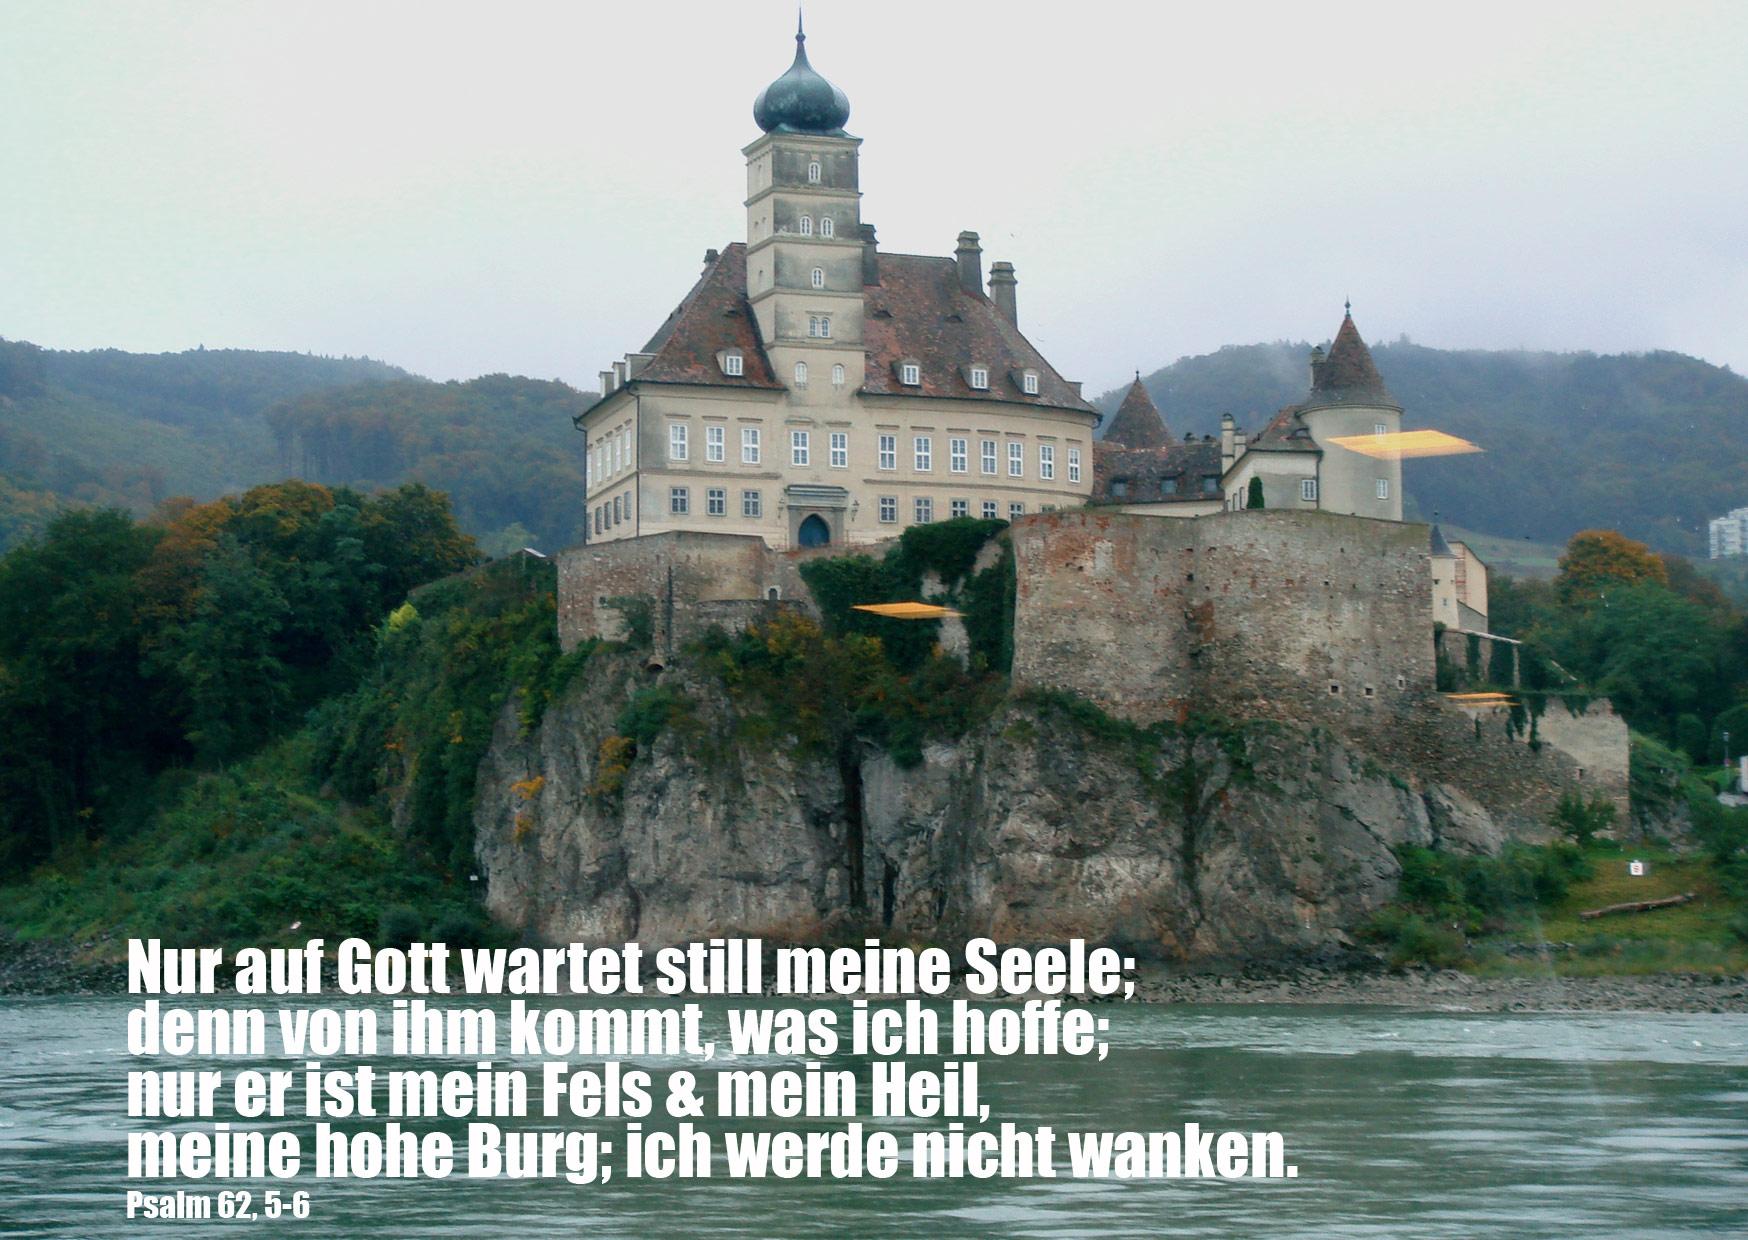 Bibelzitat, Psalm 62,5, Burg, Foto: Walter Danzer, Jesus, Bibel, go 4 Jesus